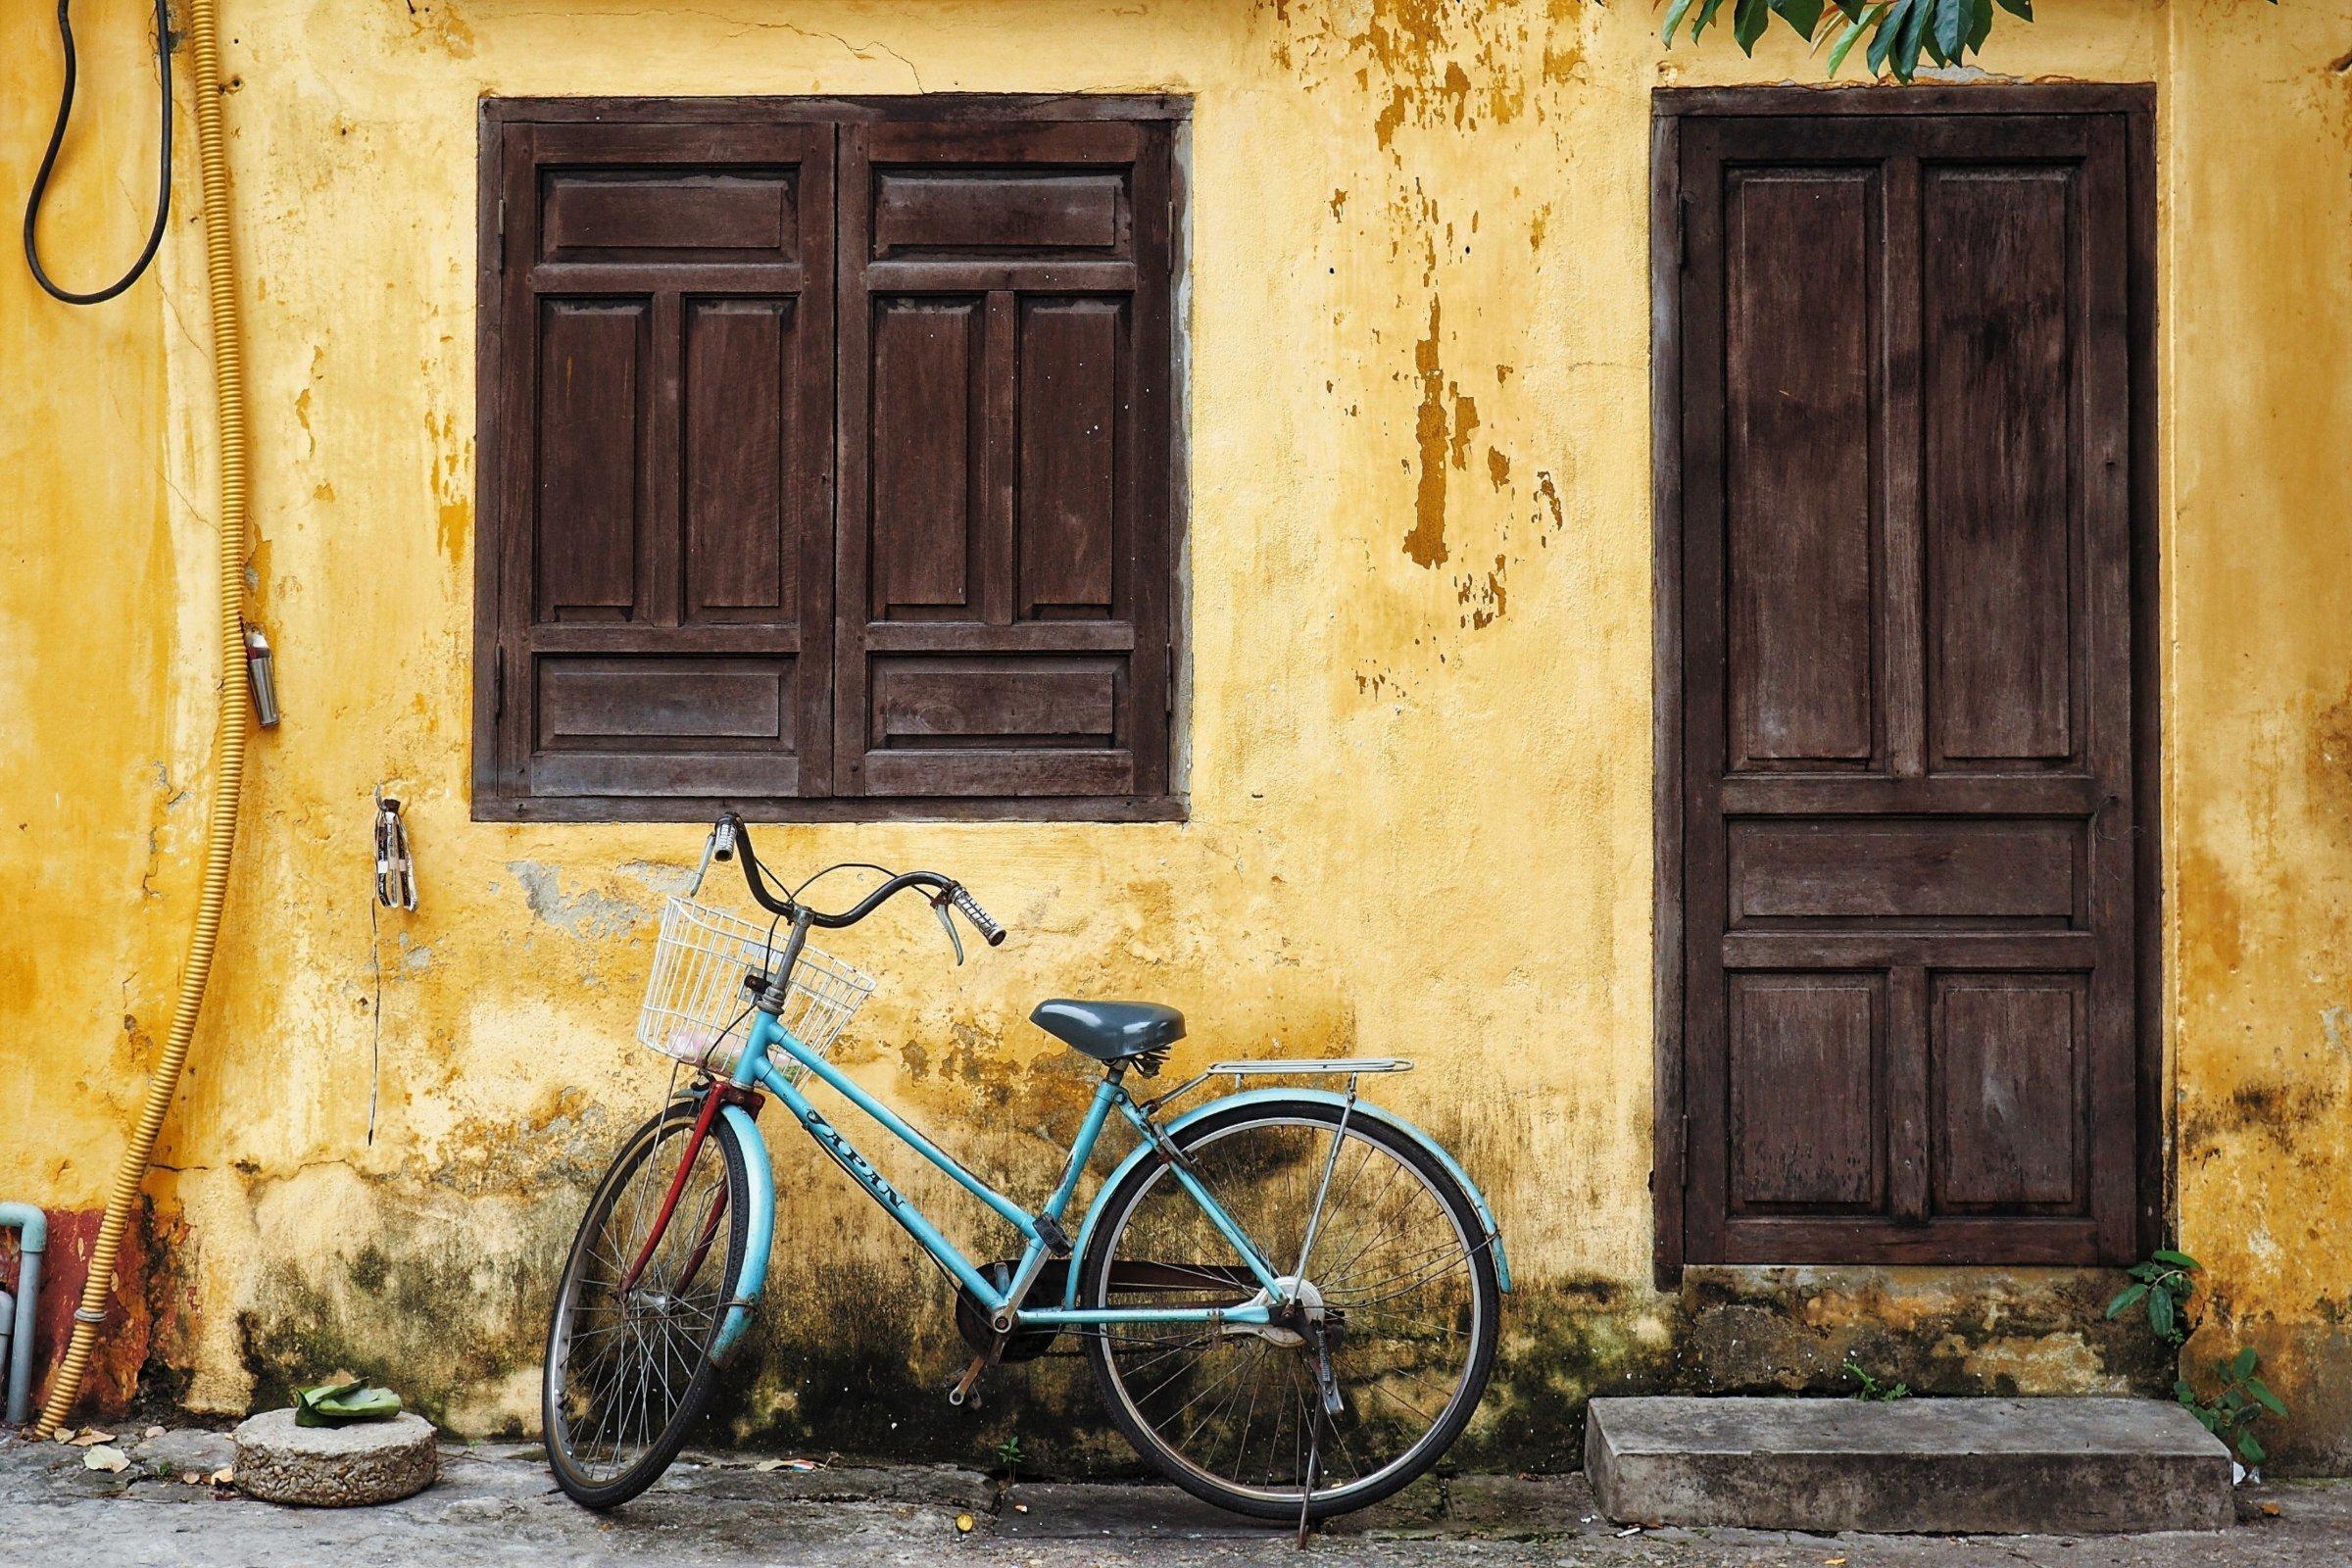 14-Day Vietnam Greatest Highlights - Vietnam Itinerary